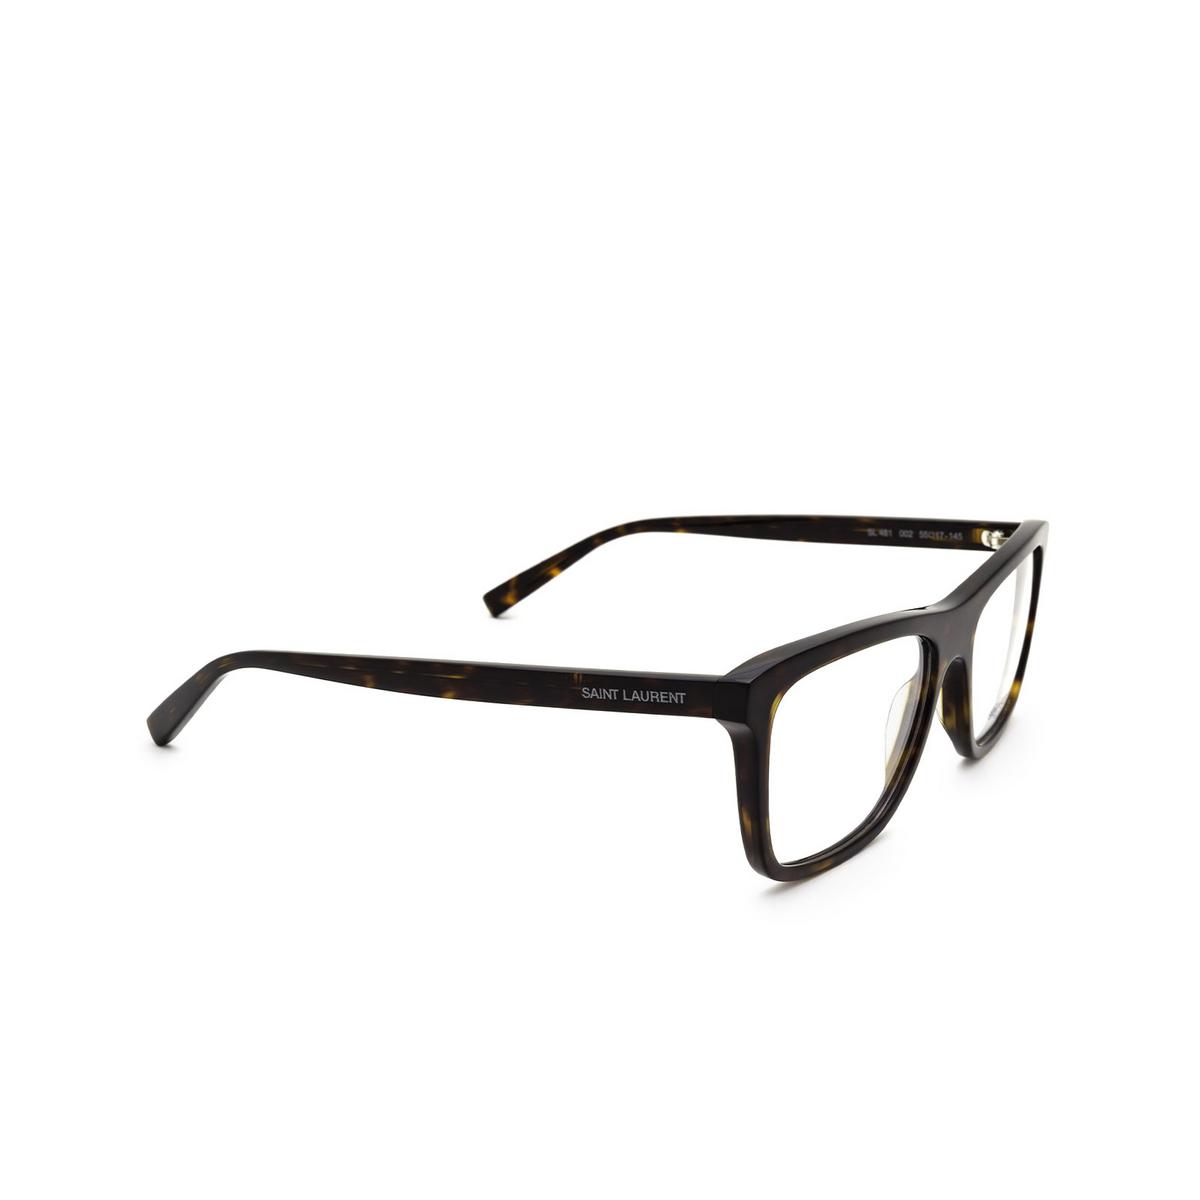 Saint Laurent® Rectangle Eyeglasses: SL 481 color Dark Havana 002 - three-quarters view.